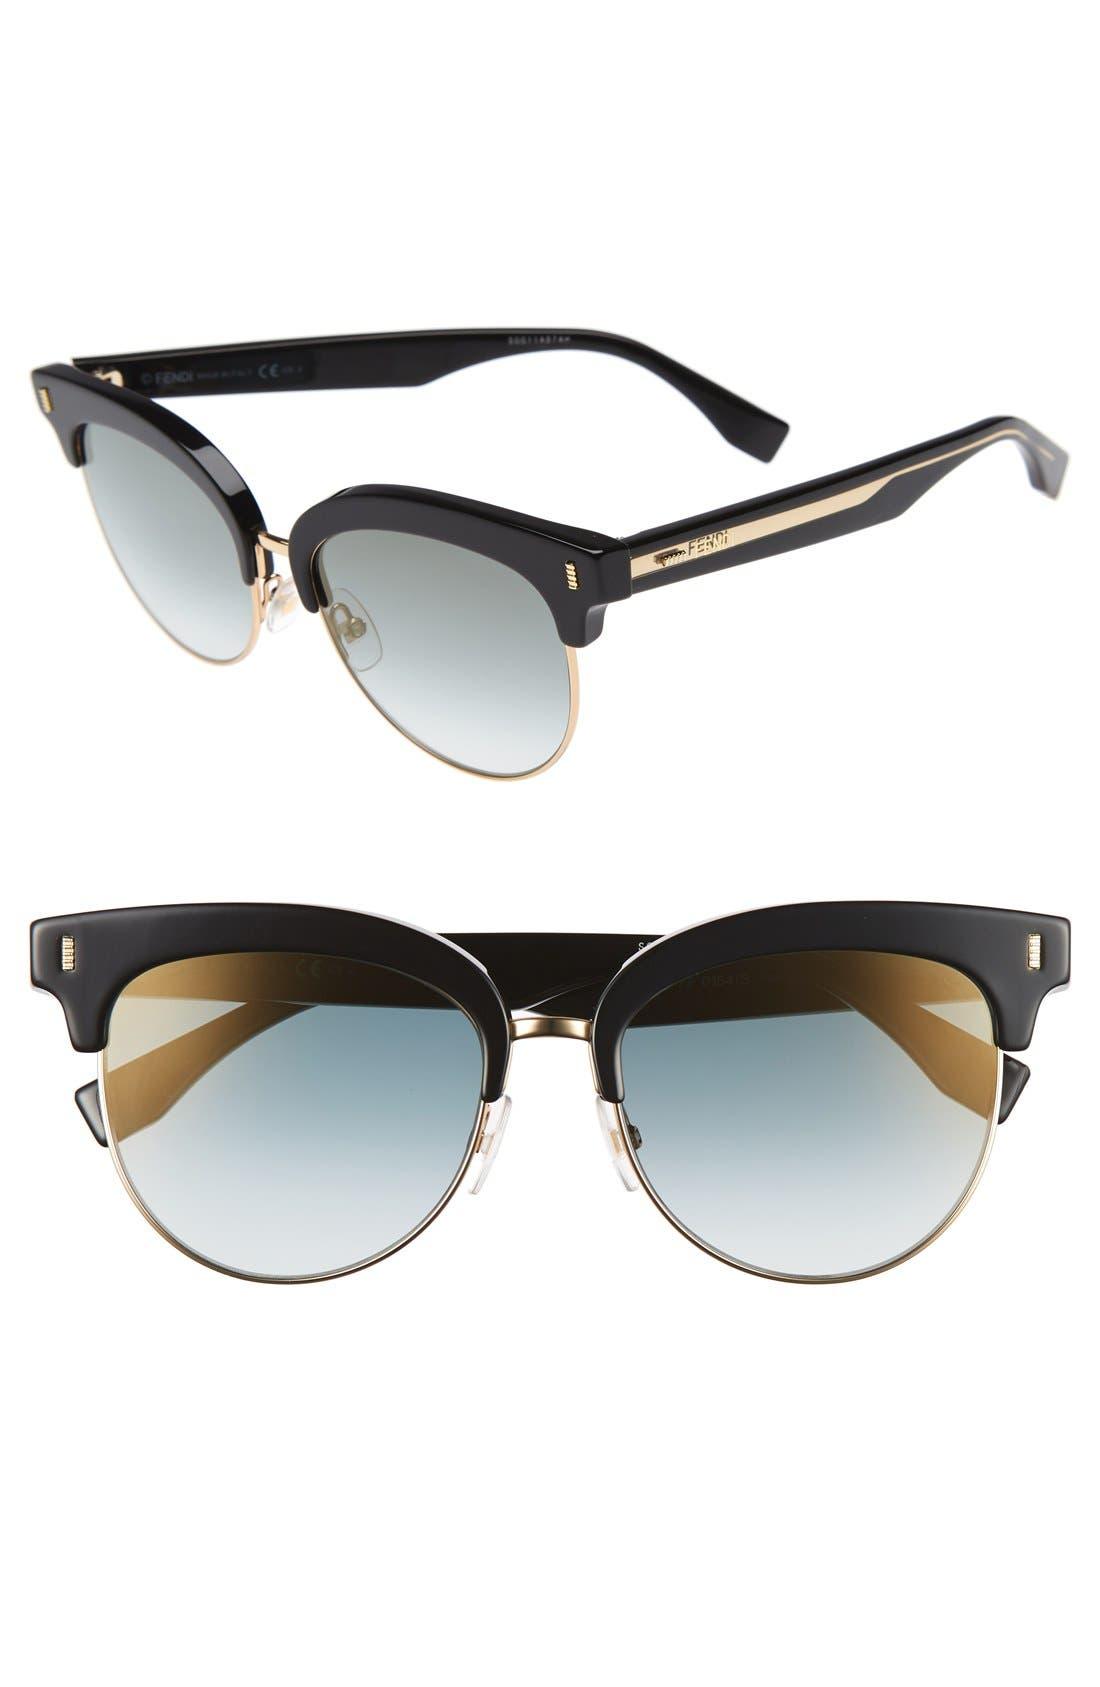 54mm Sunglasses,                             Main thumbnail 1, color,                             Black